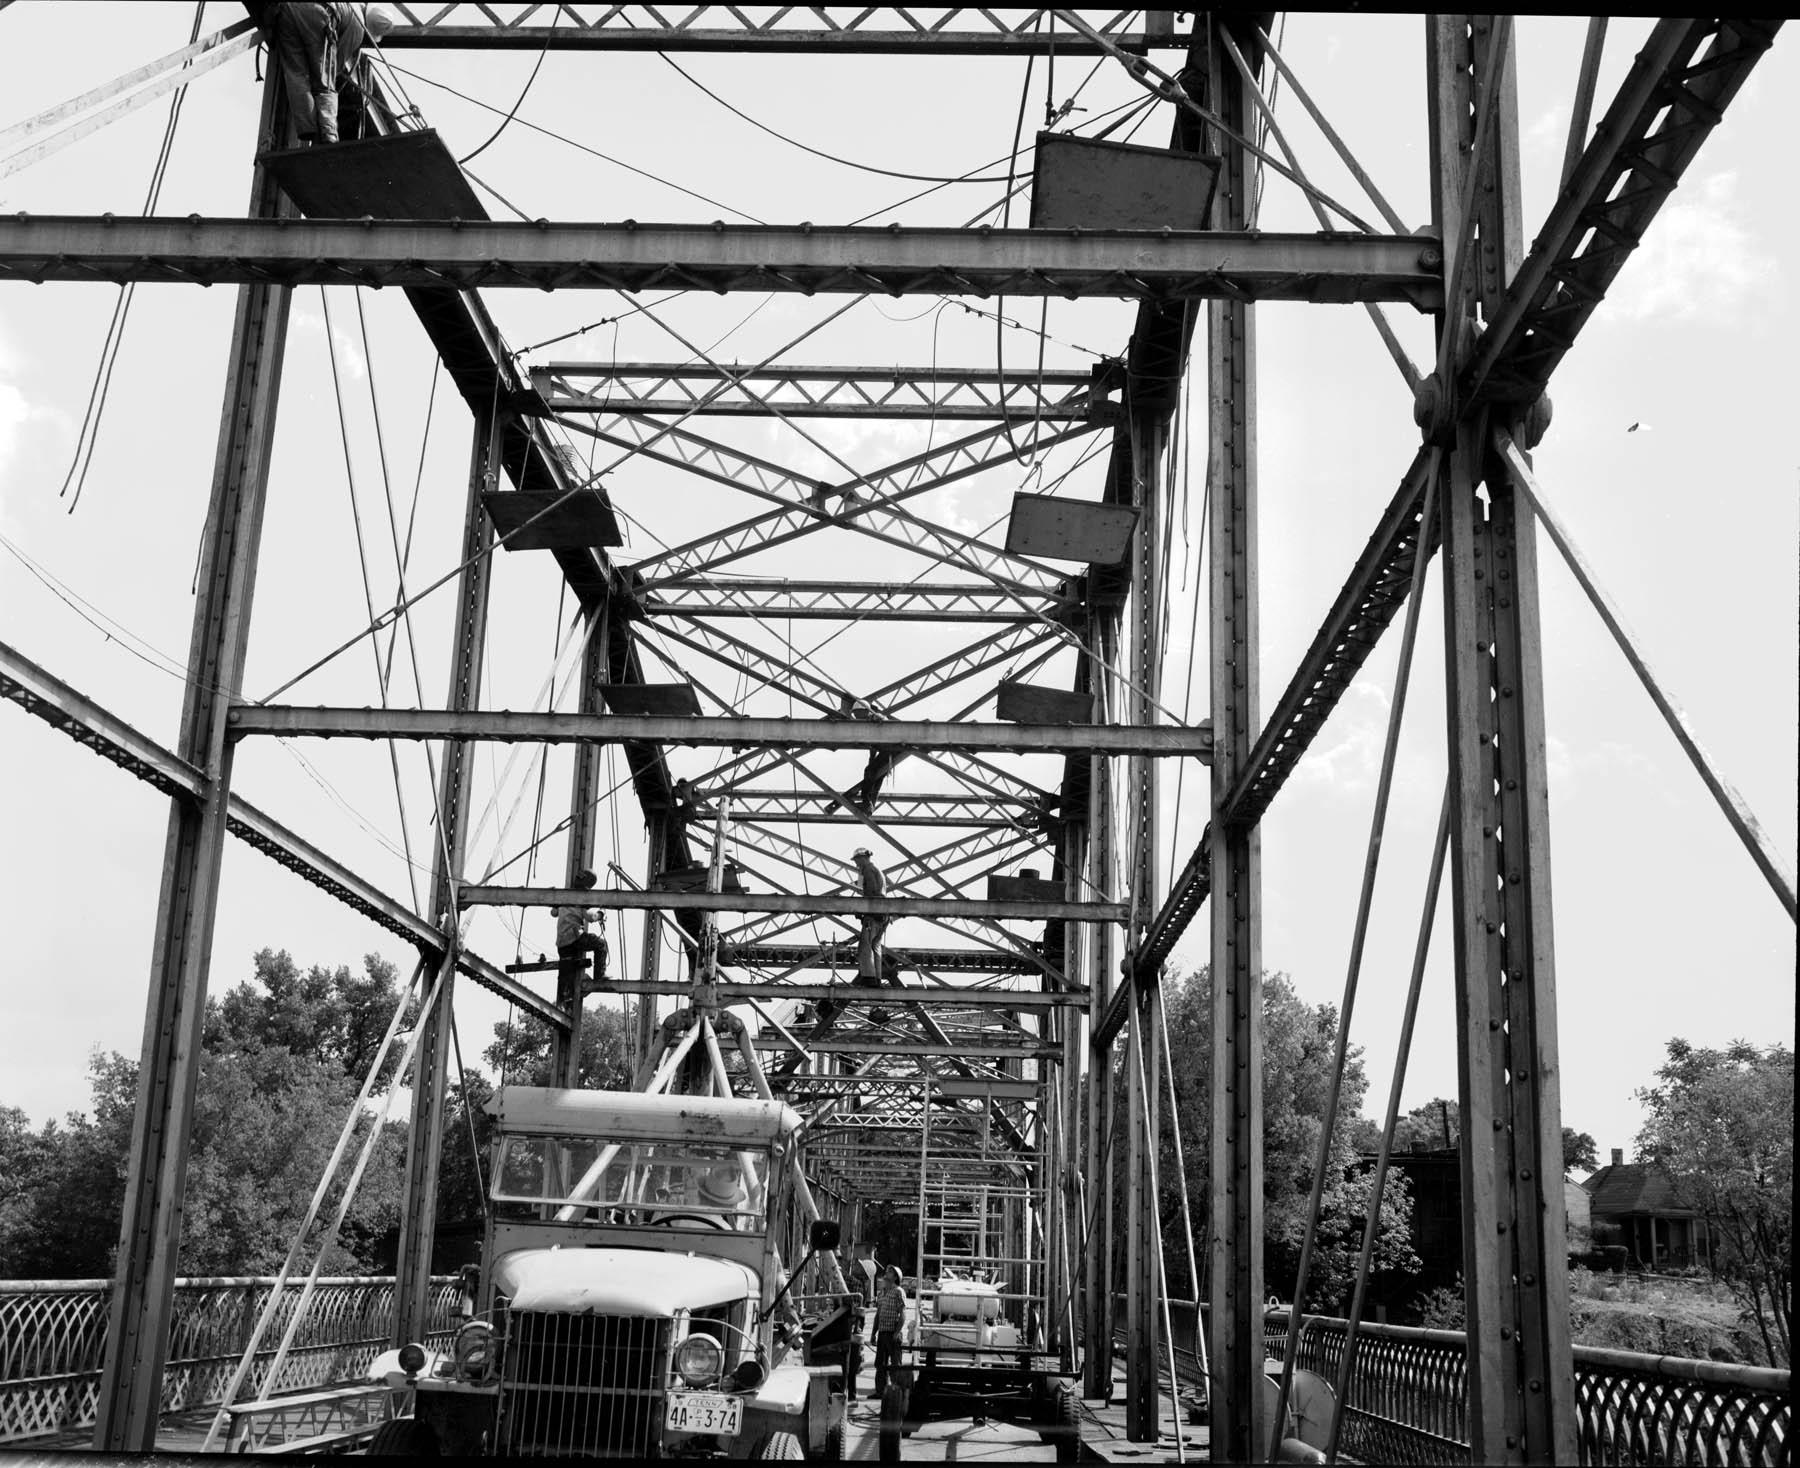 Repair work on the Walnut Street Bridge in the late 1950s.